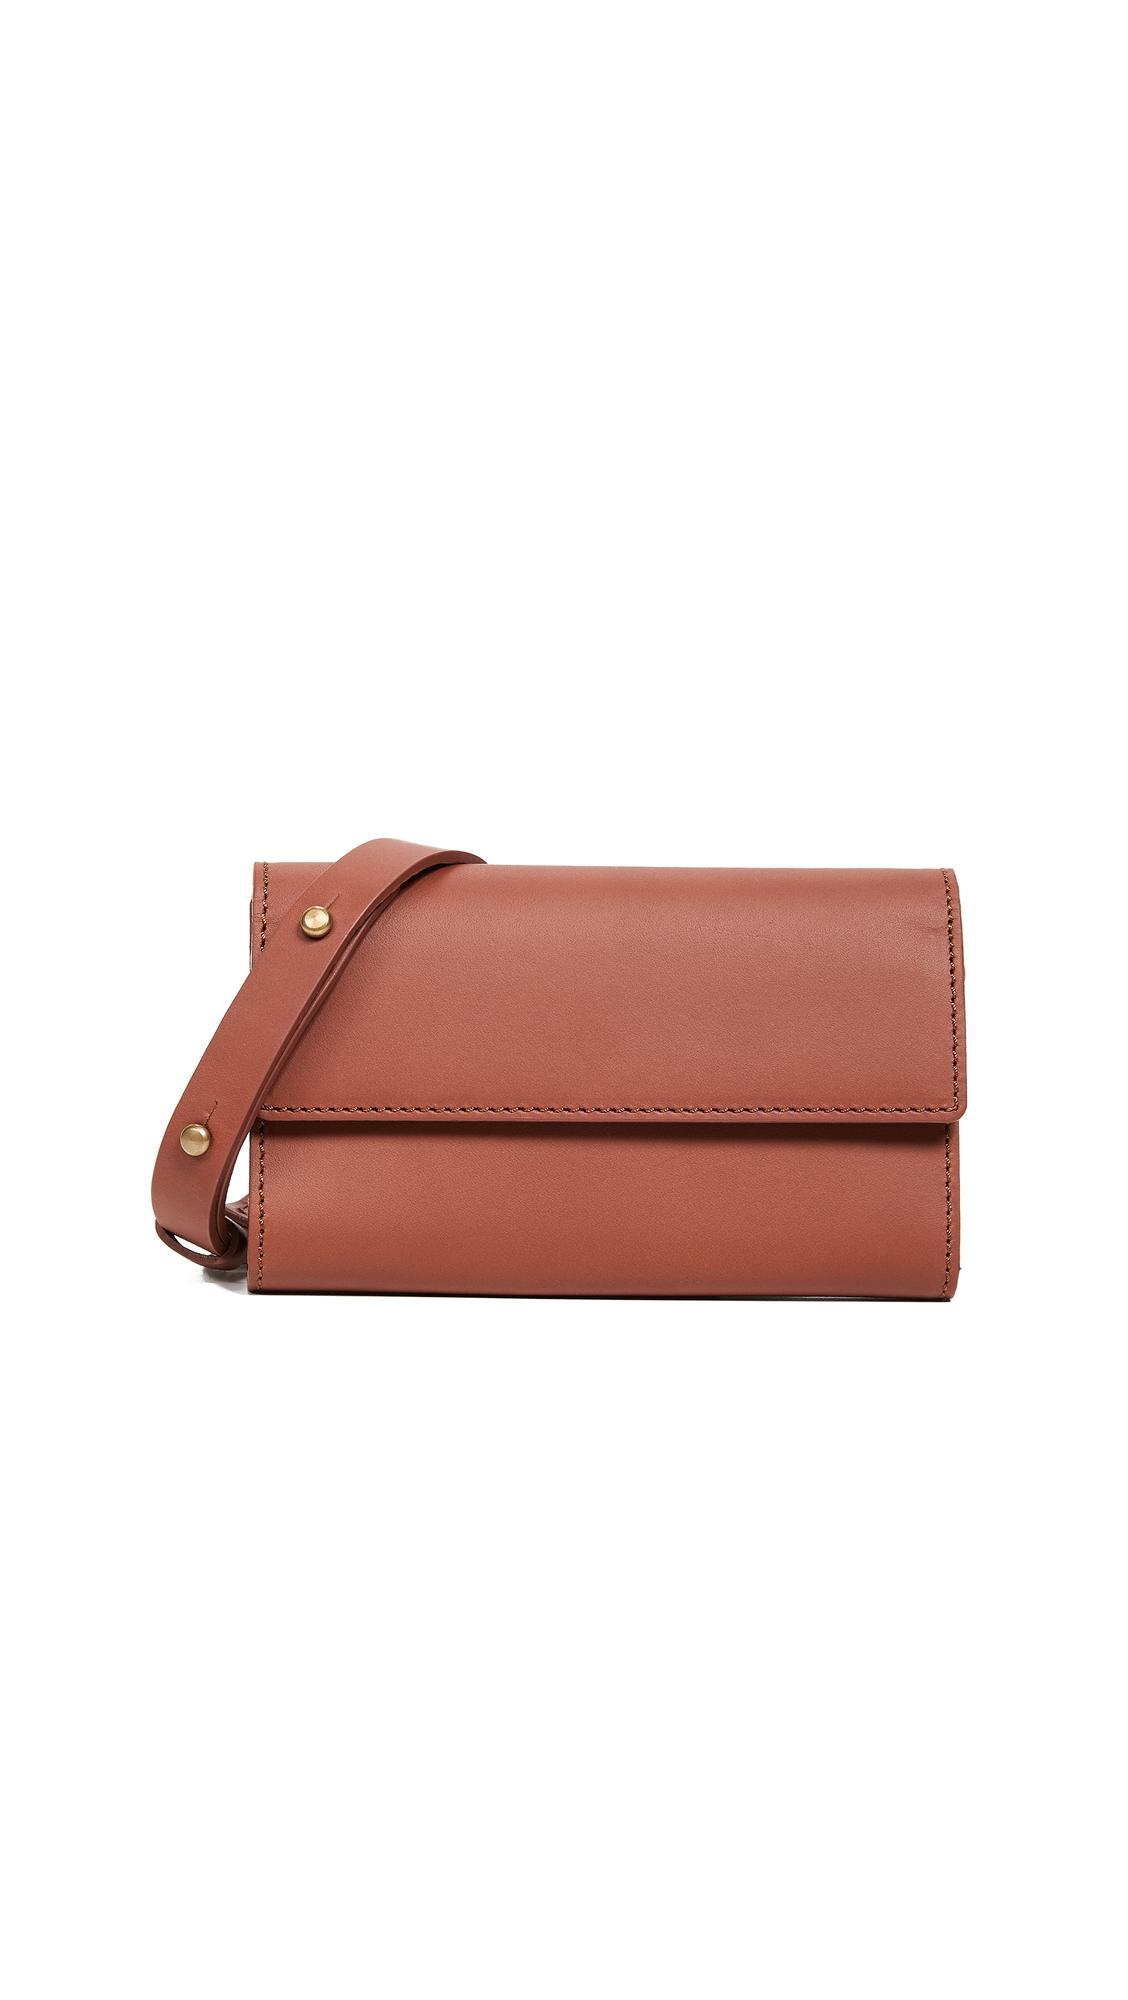 Vereverto Ado Convertible Belt Bag In Brown